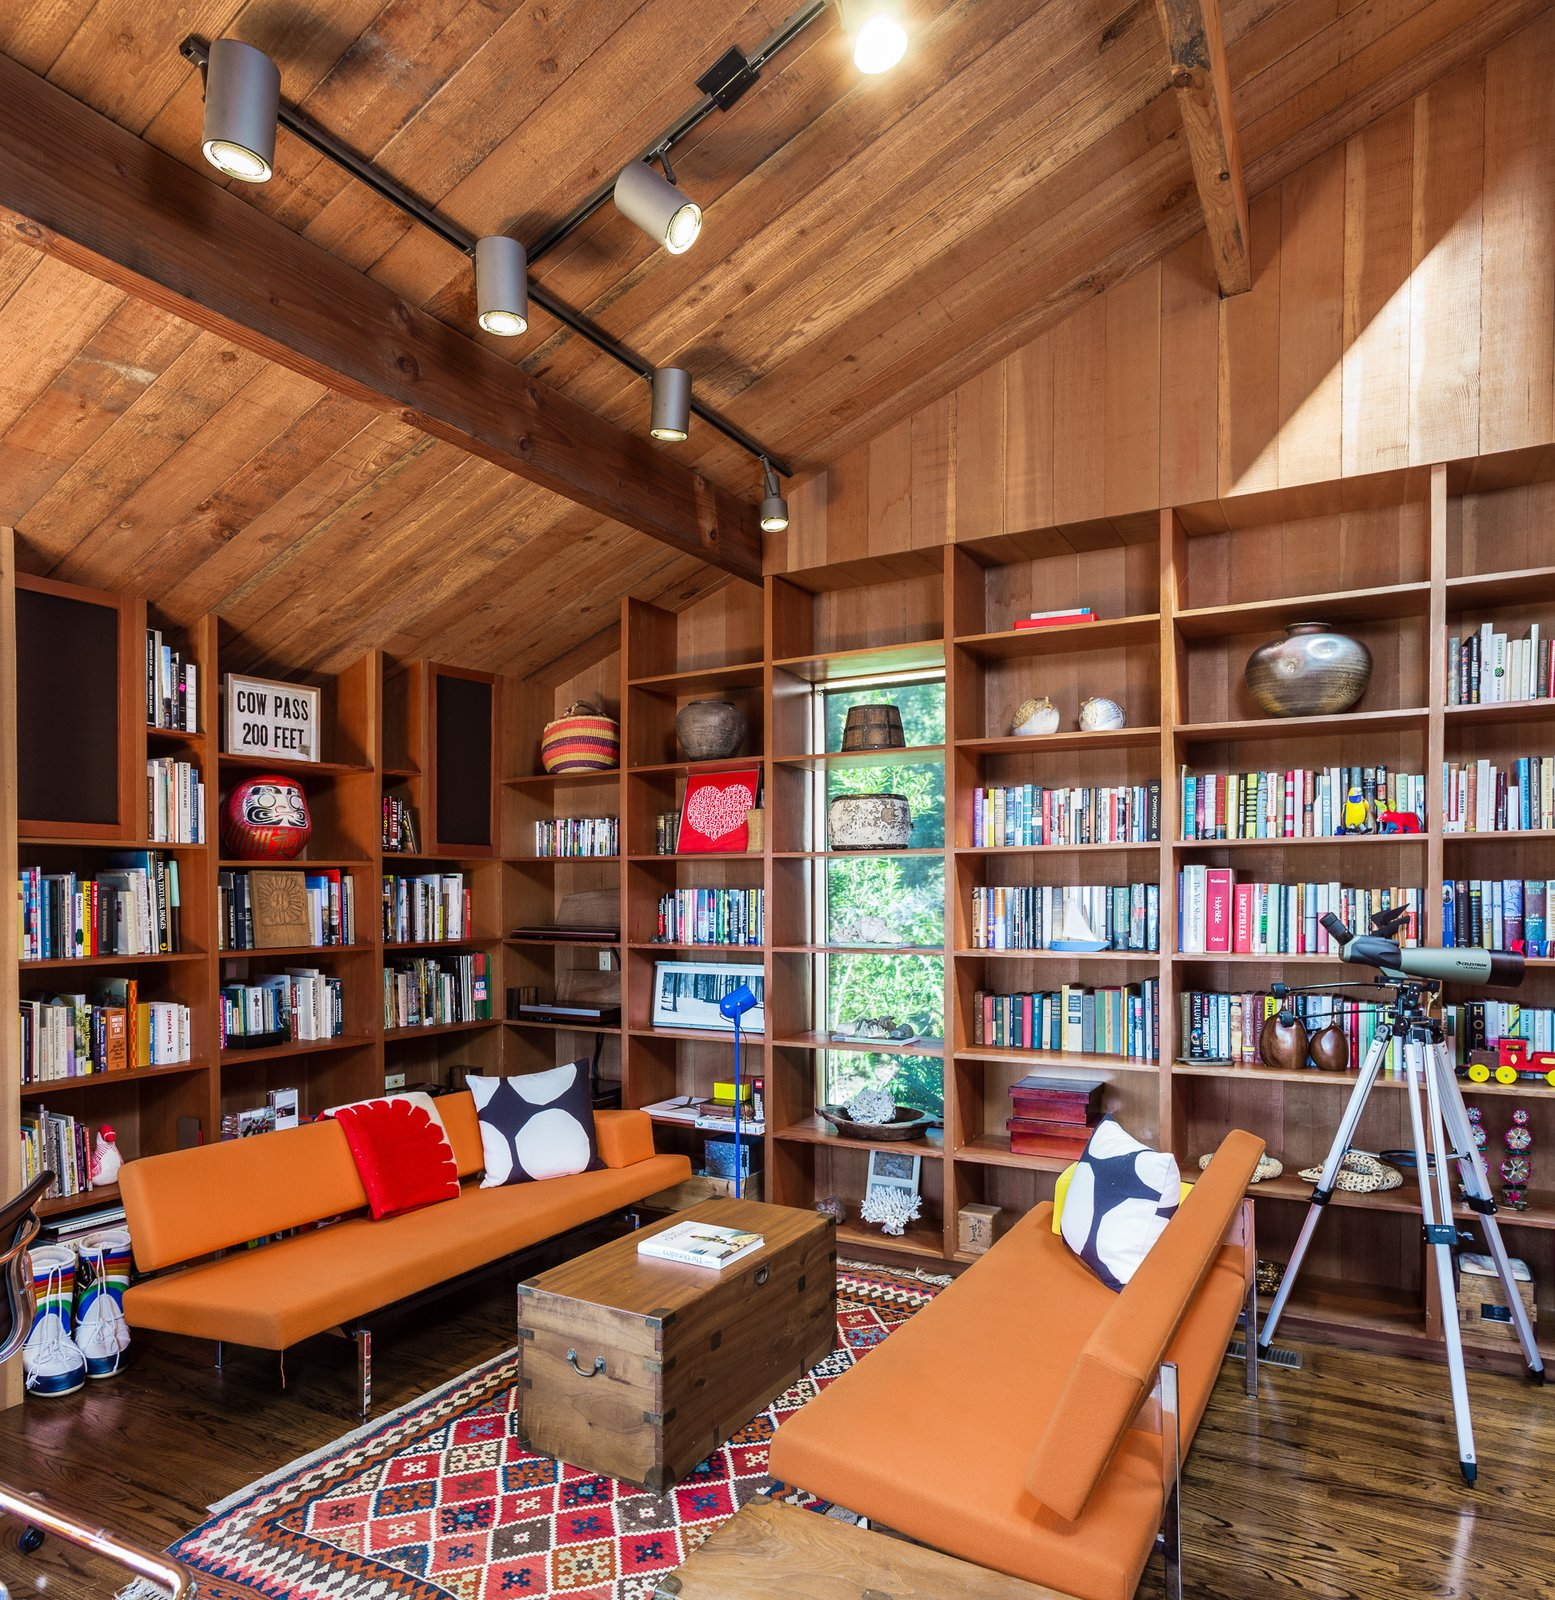 A den filled with built-in bookshelves.